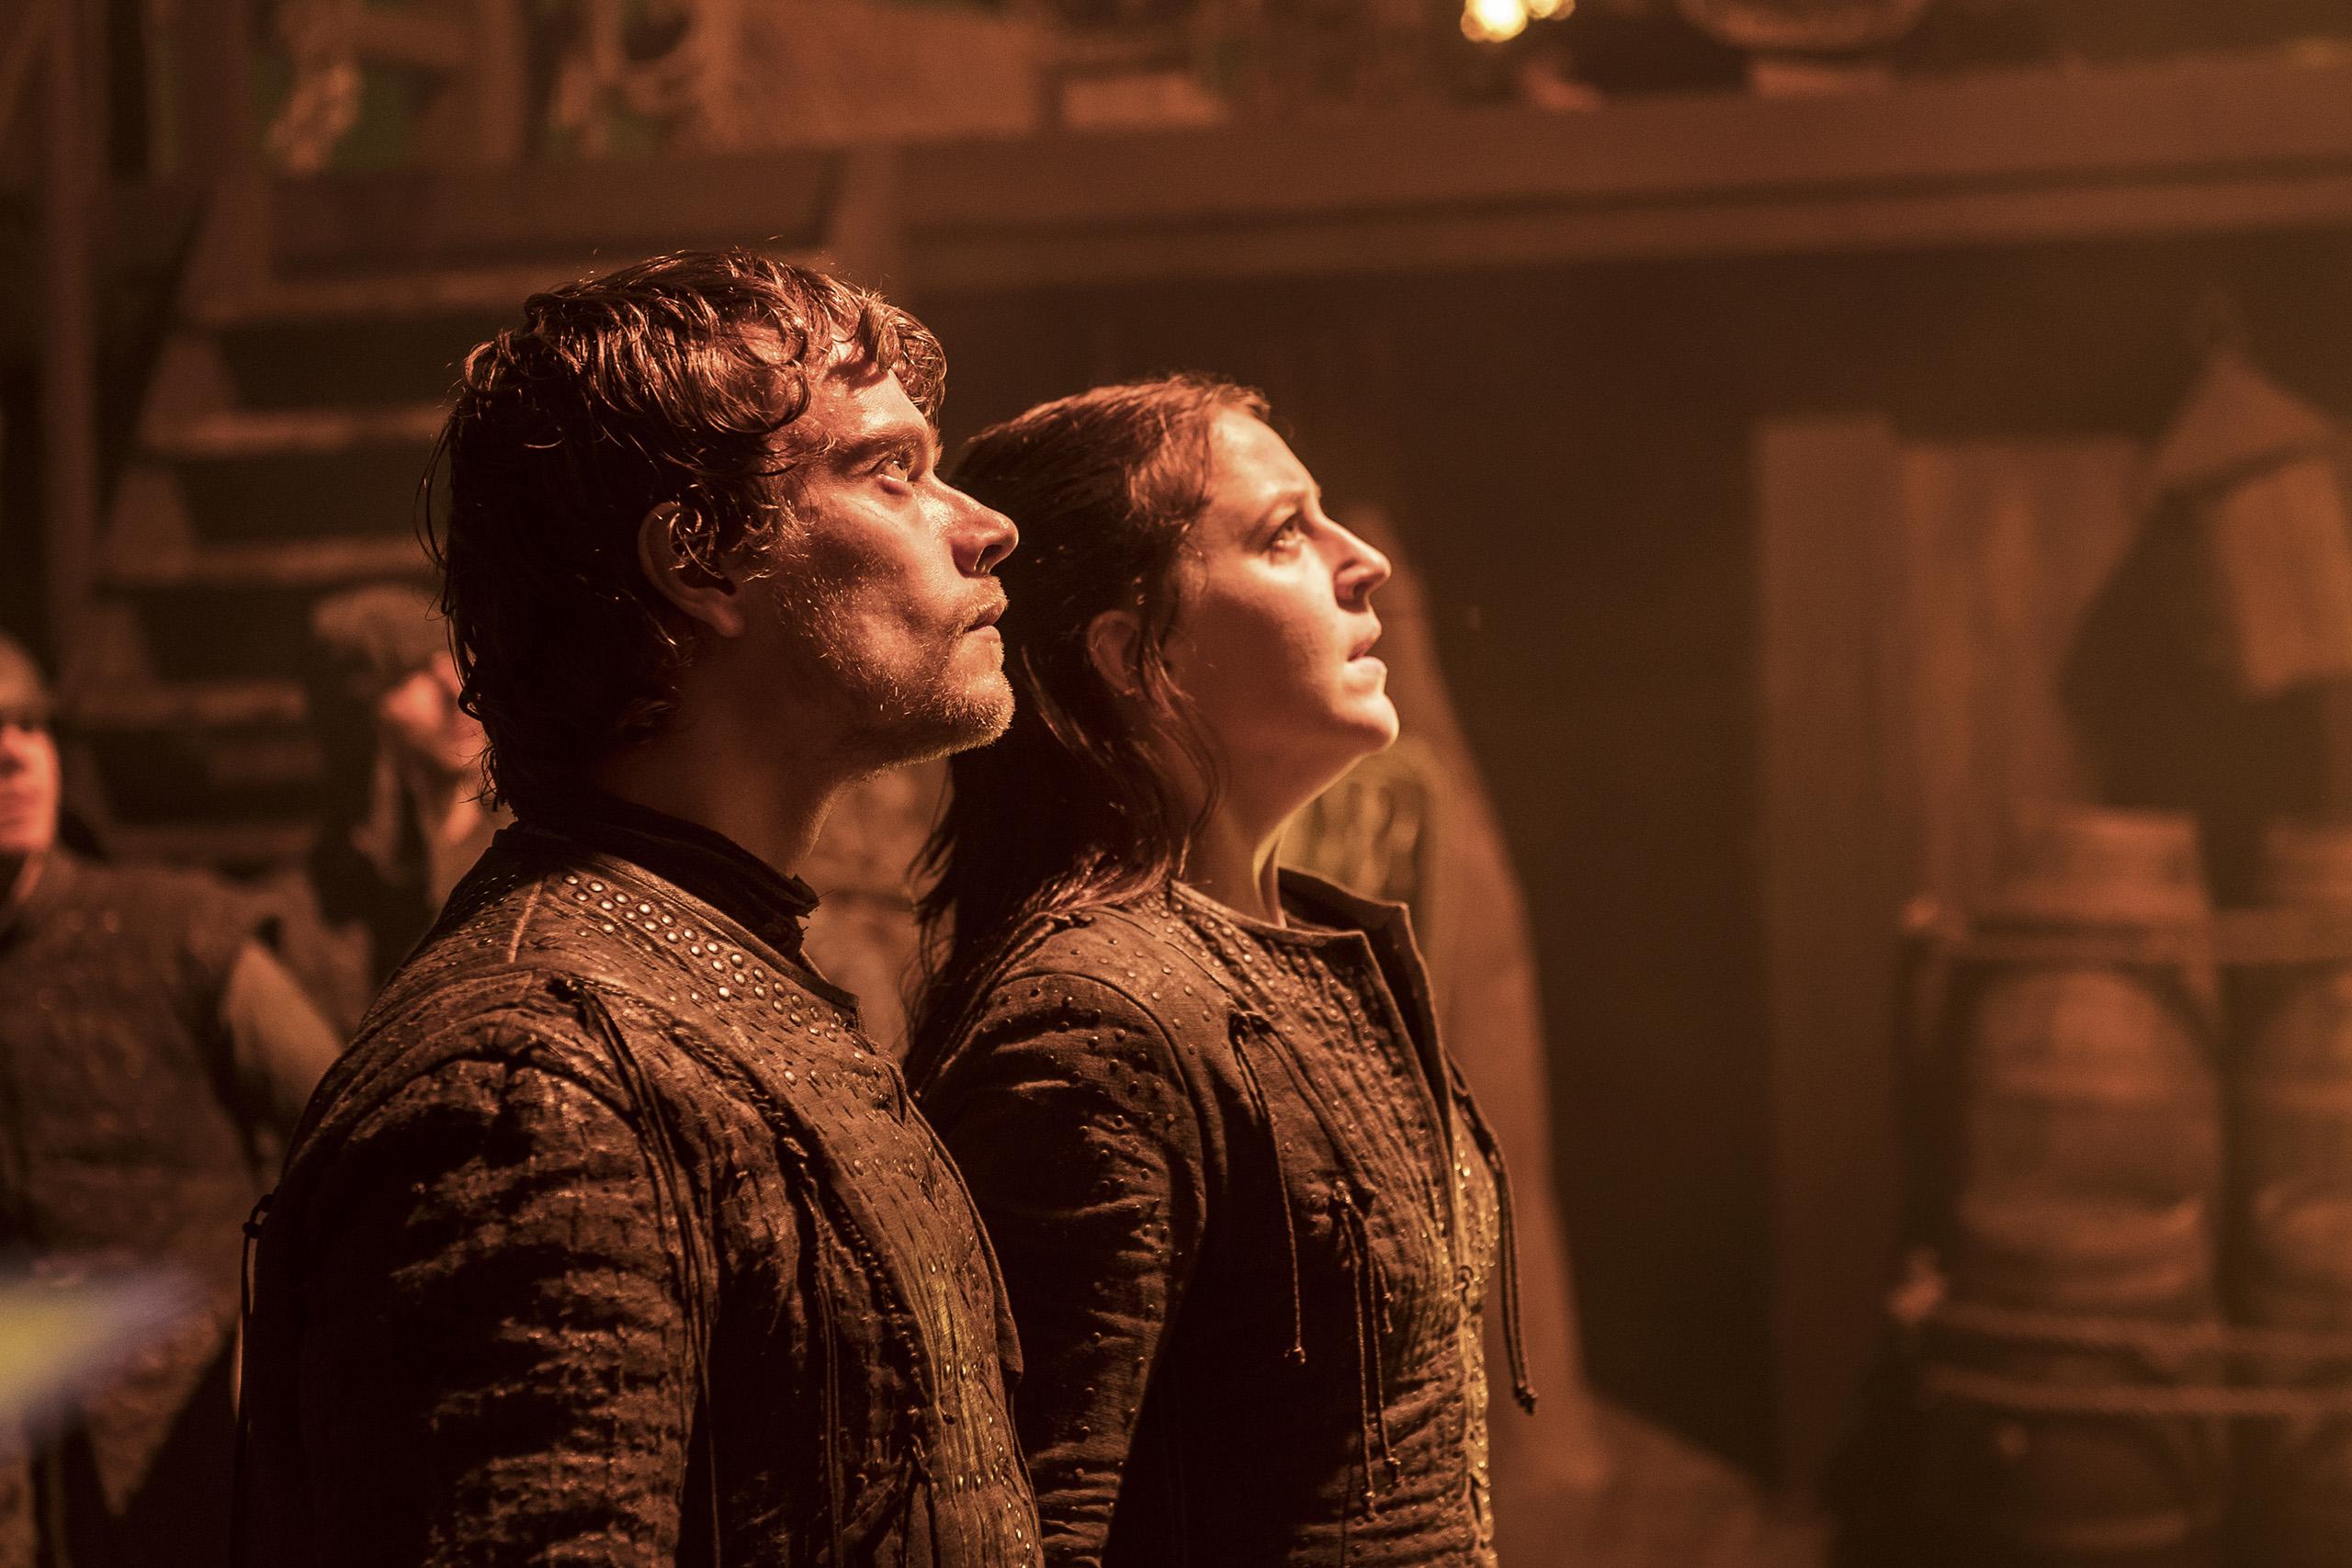 Alfie Allen and Gemma Whelan in Game of Thrones